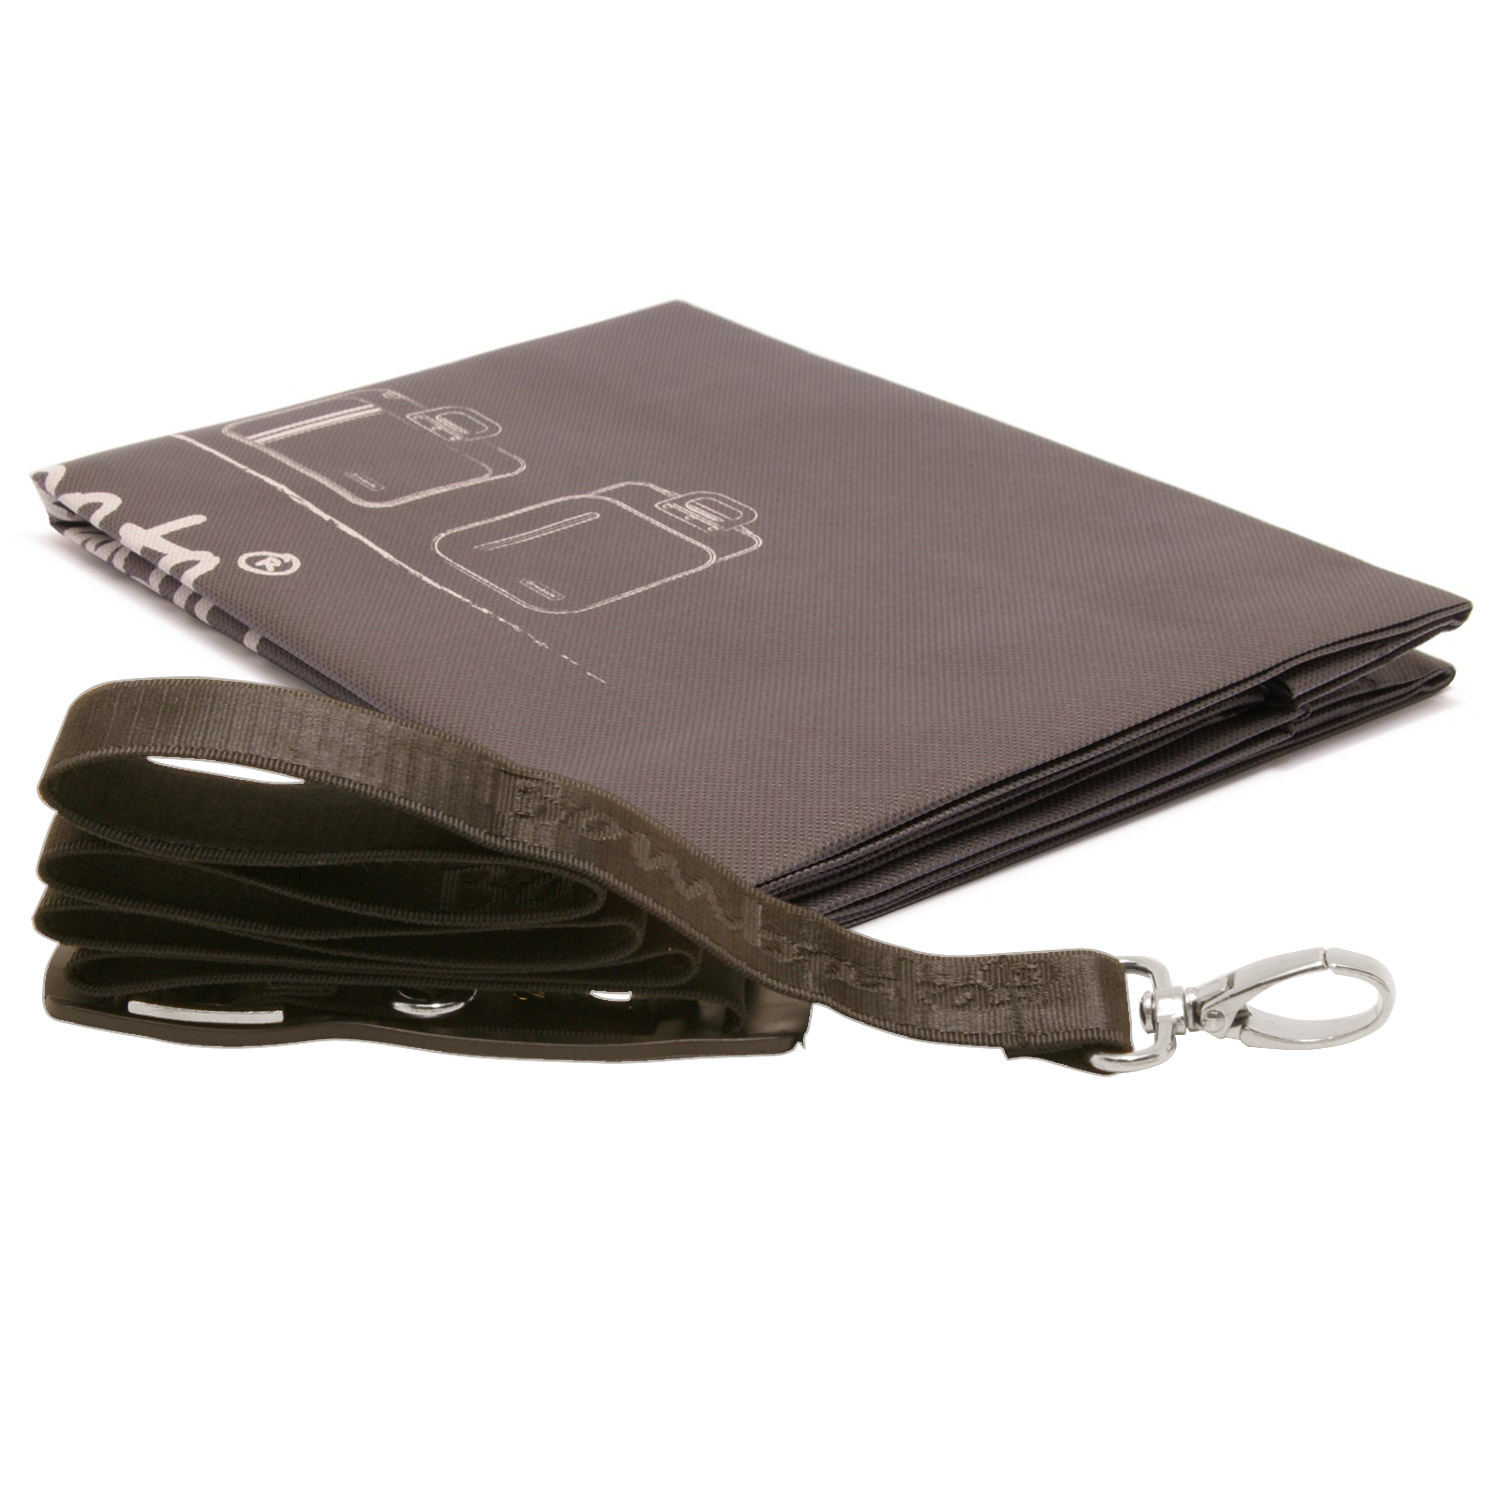 Bombata – Terracotta Brown Maxi Cocco 17″ Laptop Case/Bag with Shoulder Strap